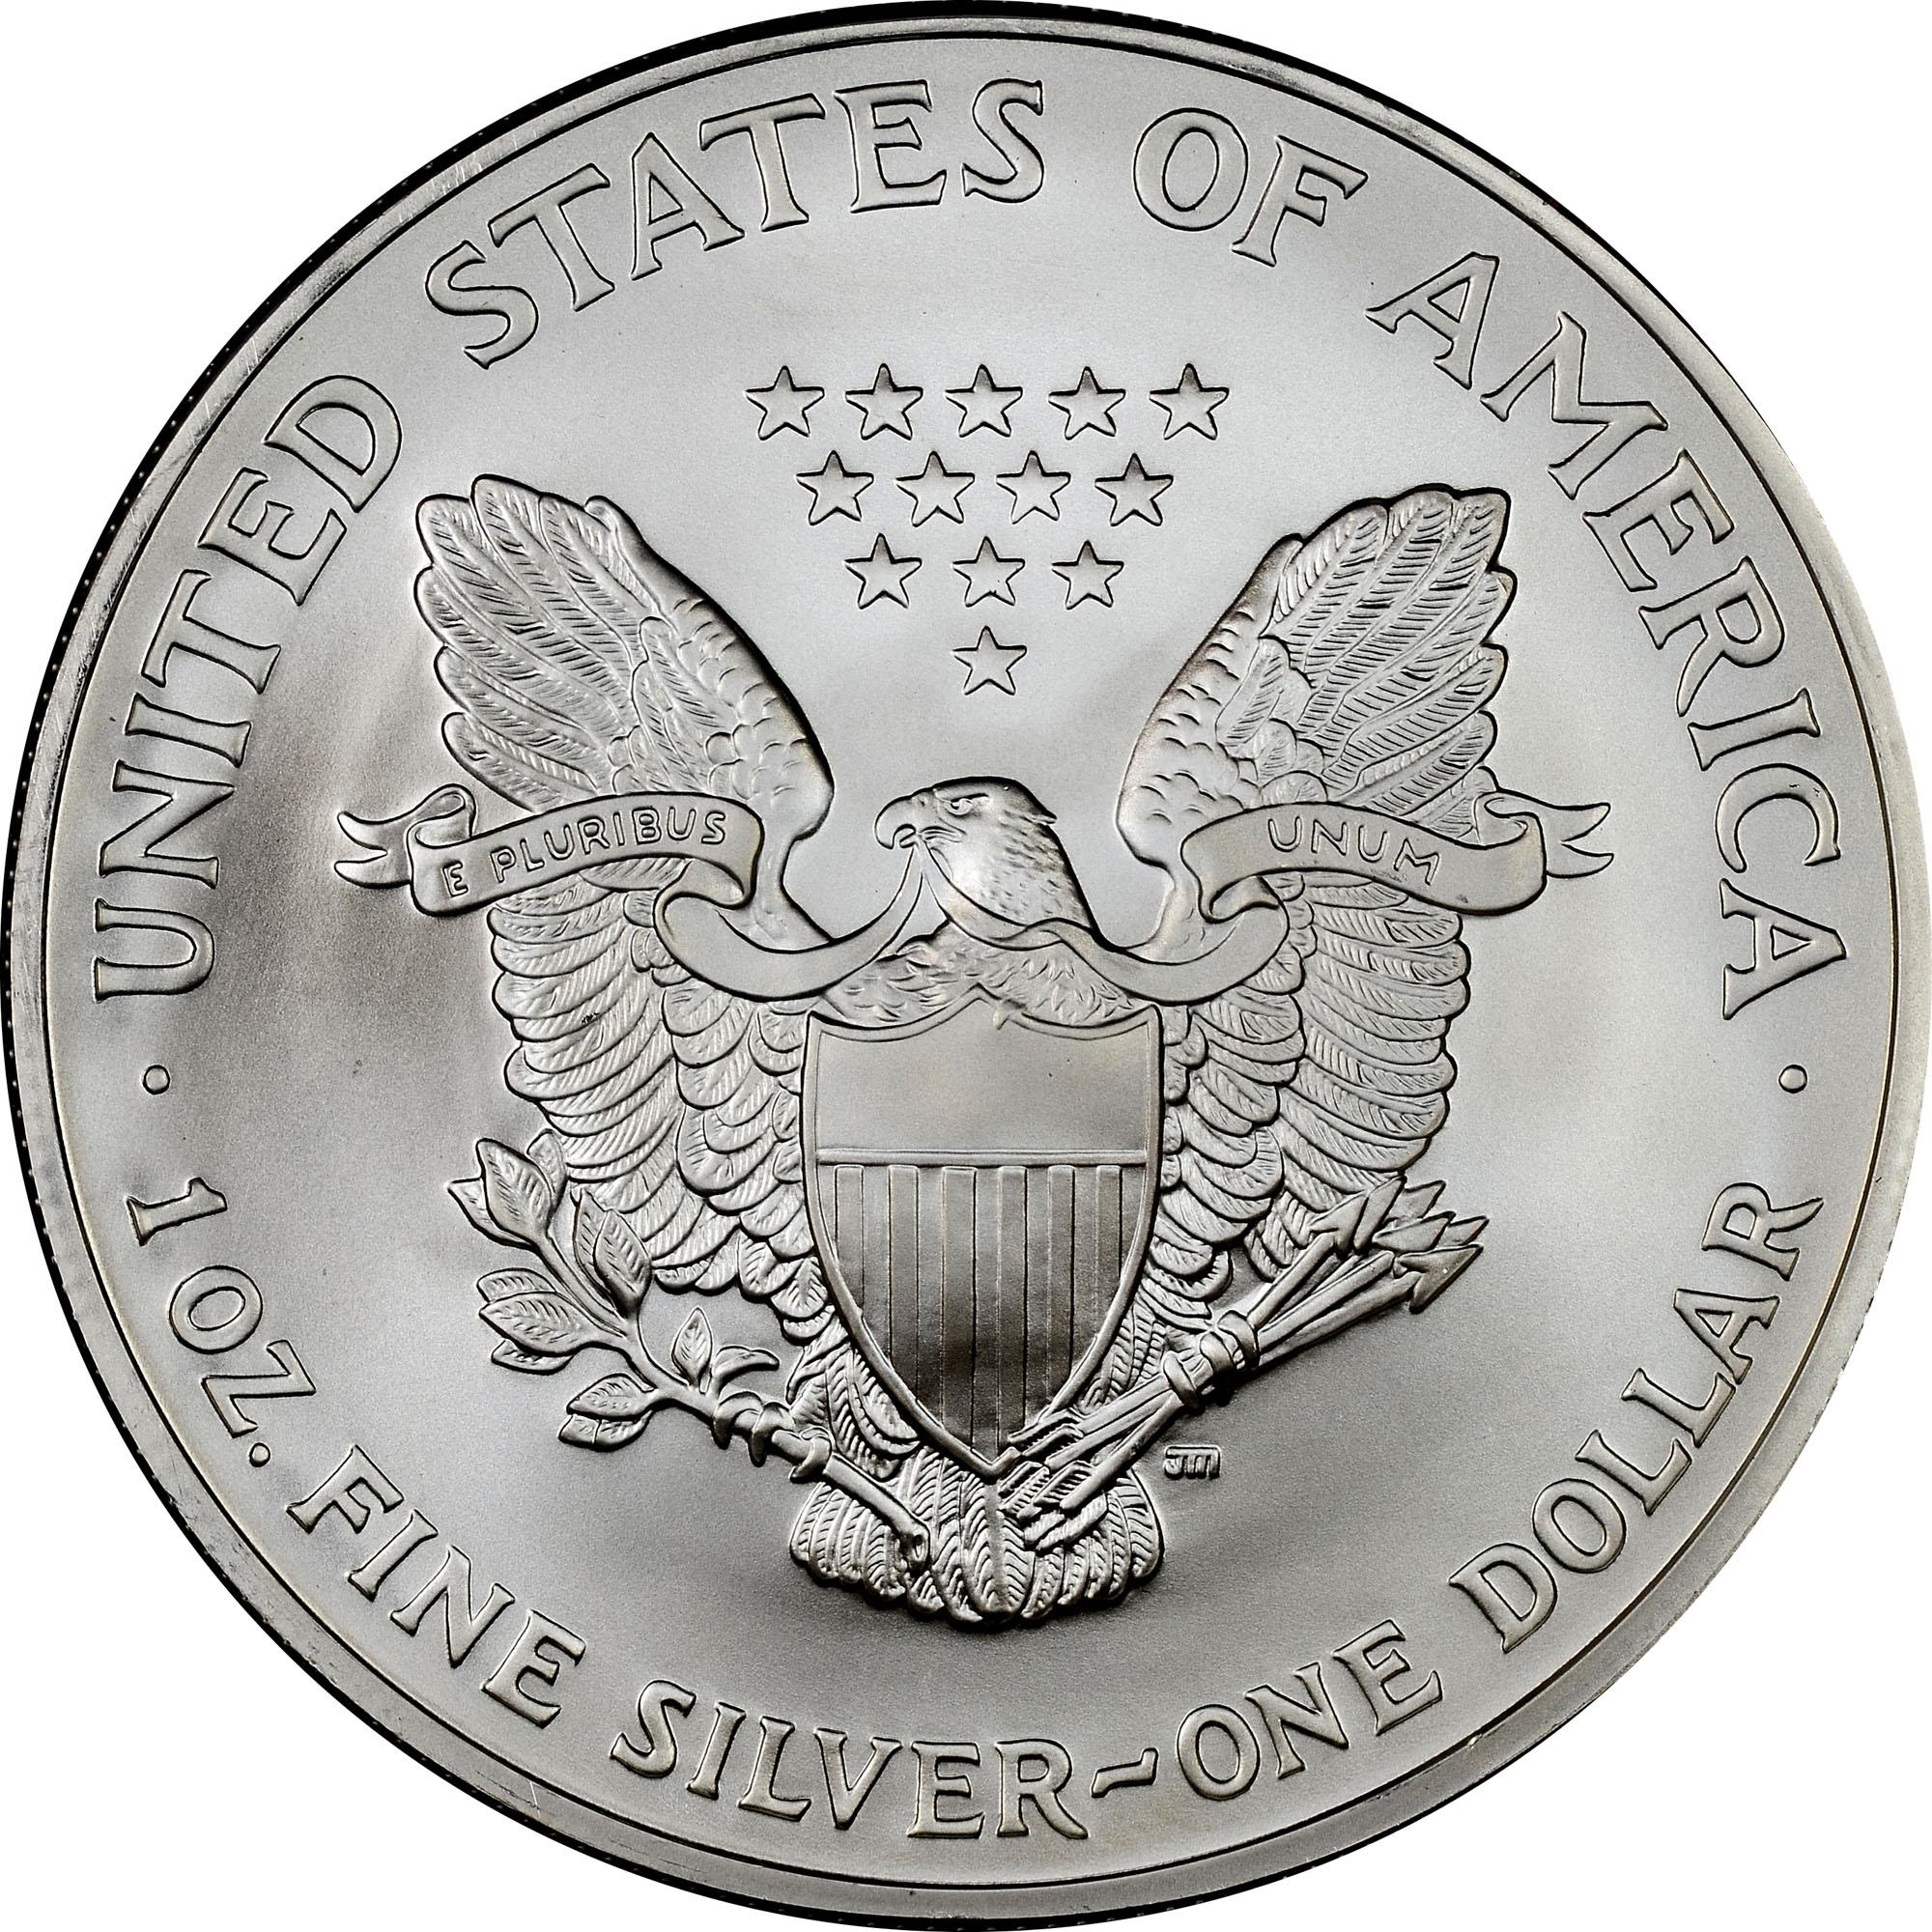 U.S. Silver Coin Melt Values | Silver Dollar Melt Value | NGC